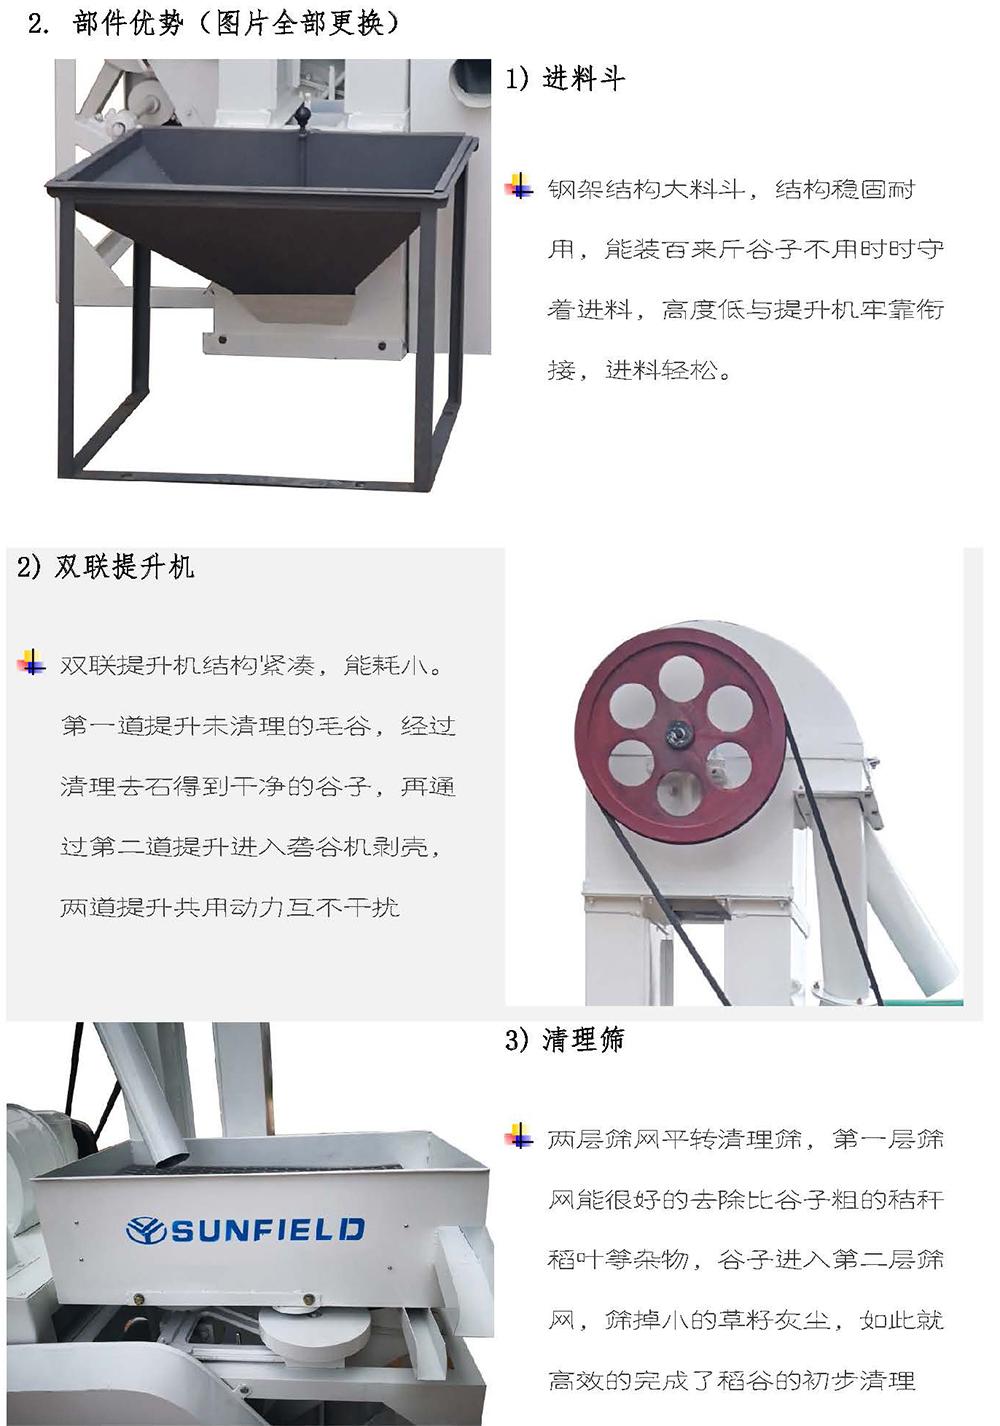 6LN-15-8.5SR礱碾組合米機-柴油機驅動-中文版_頁面_3